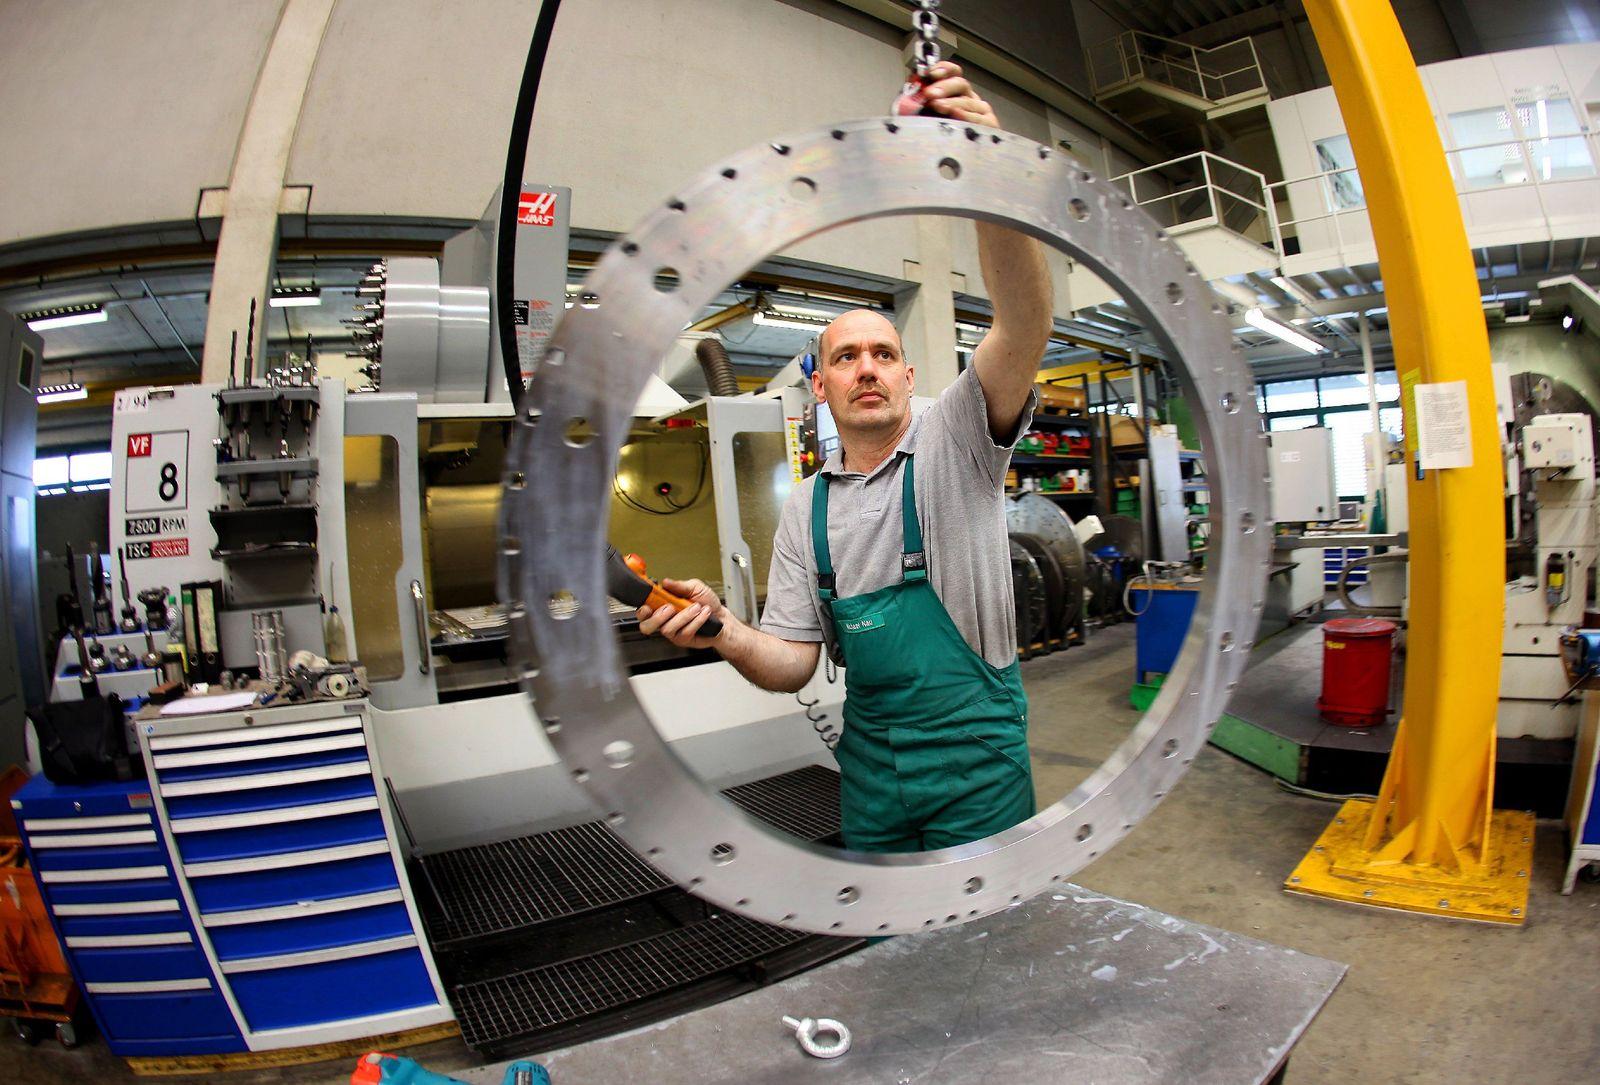 Konjunktur/ Maschinenbau